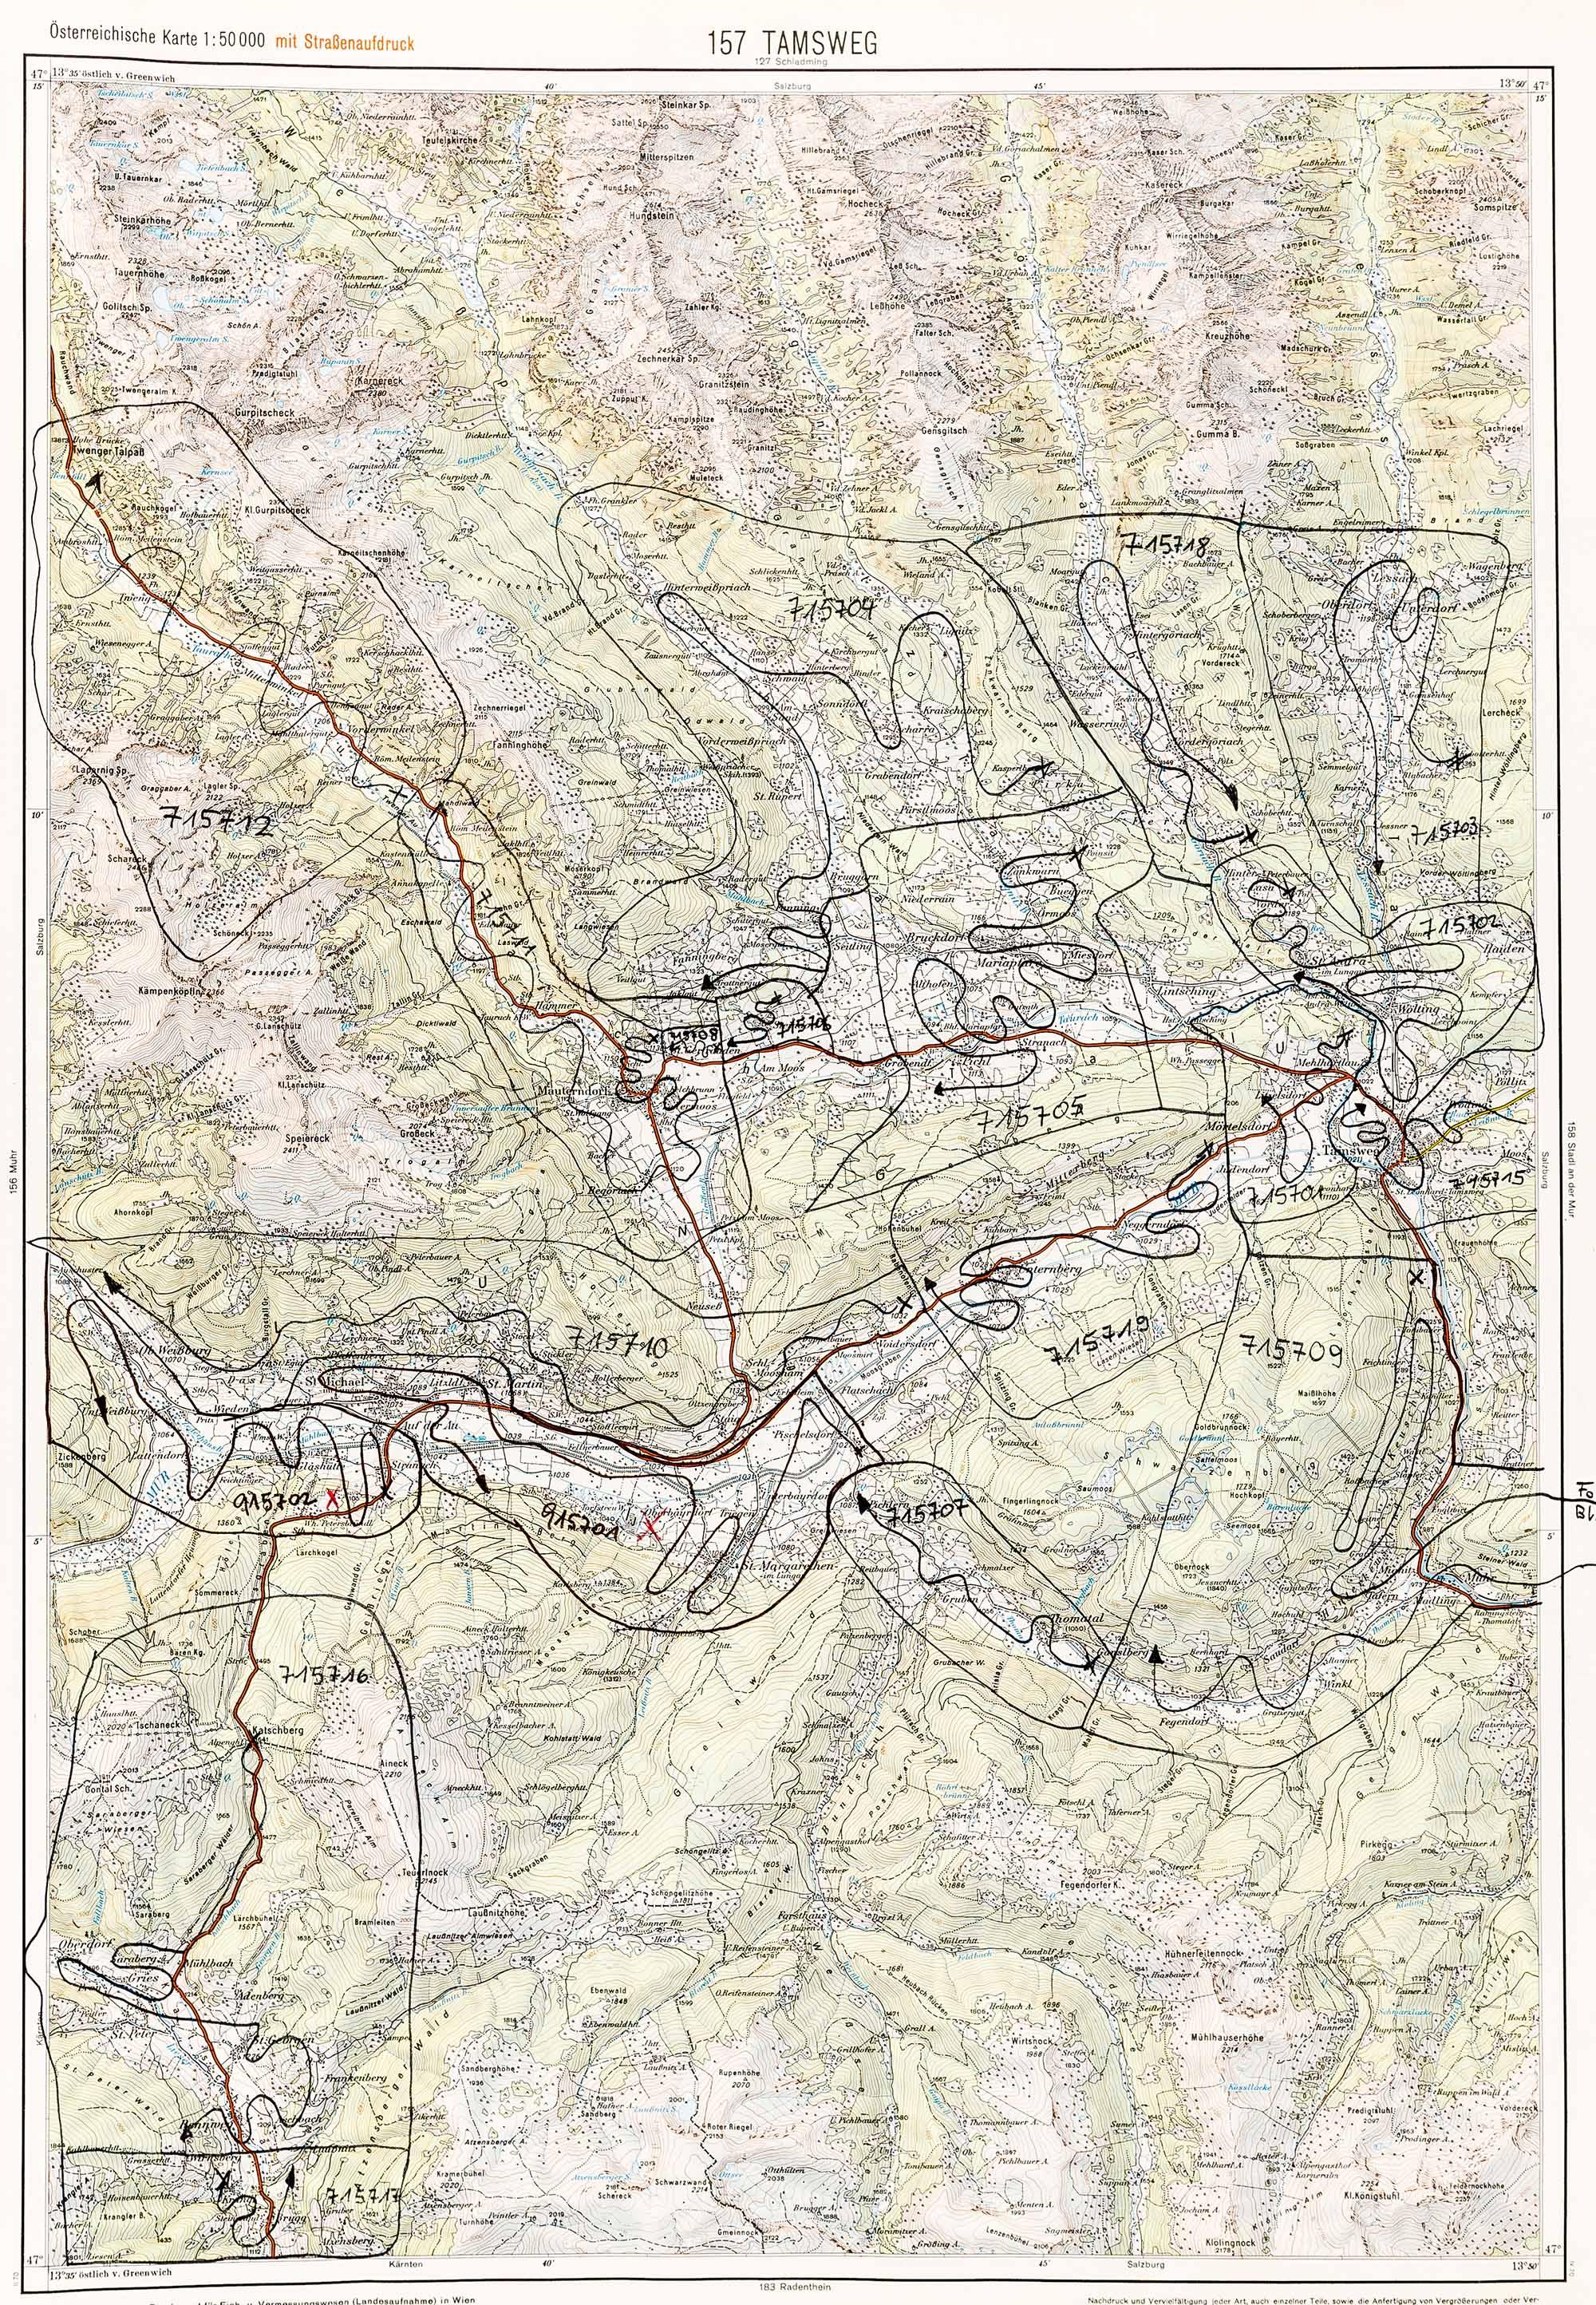 1975-1979 Karte 157